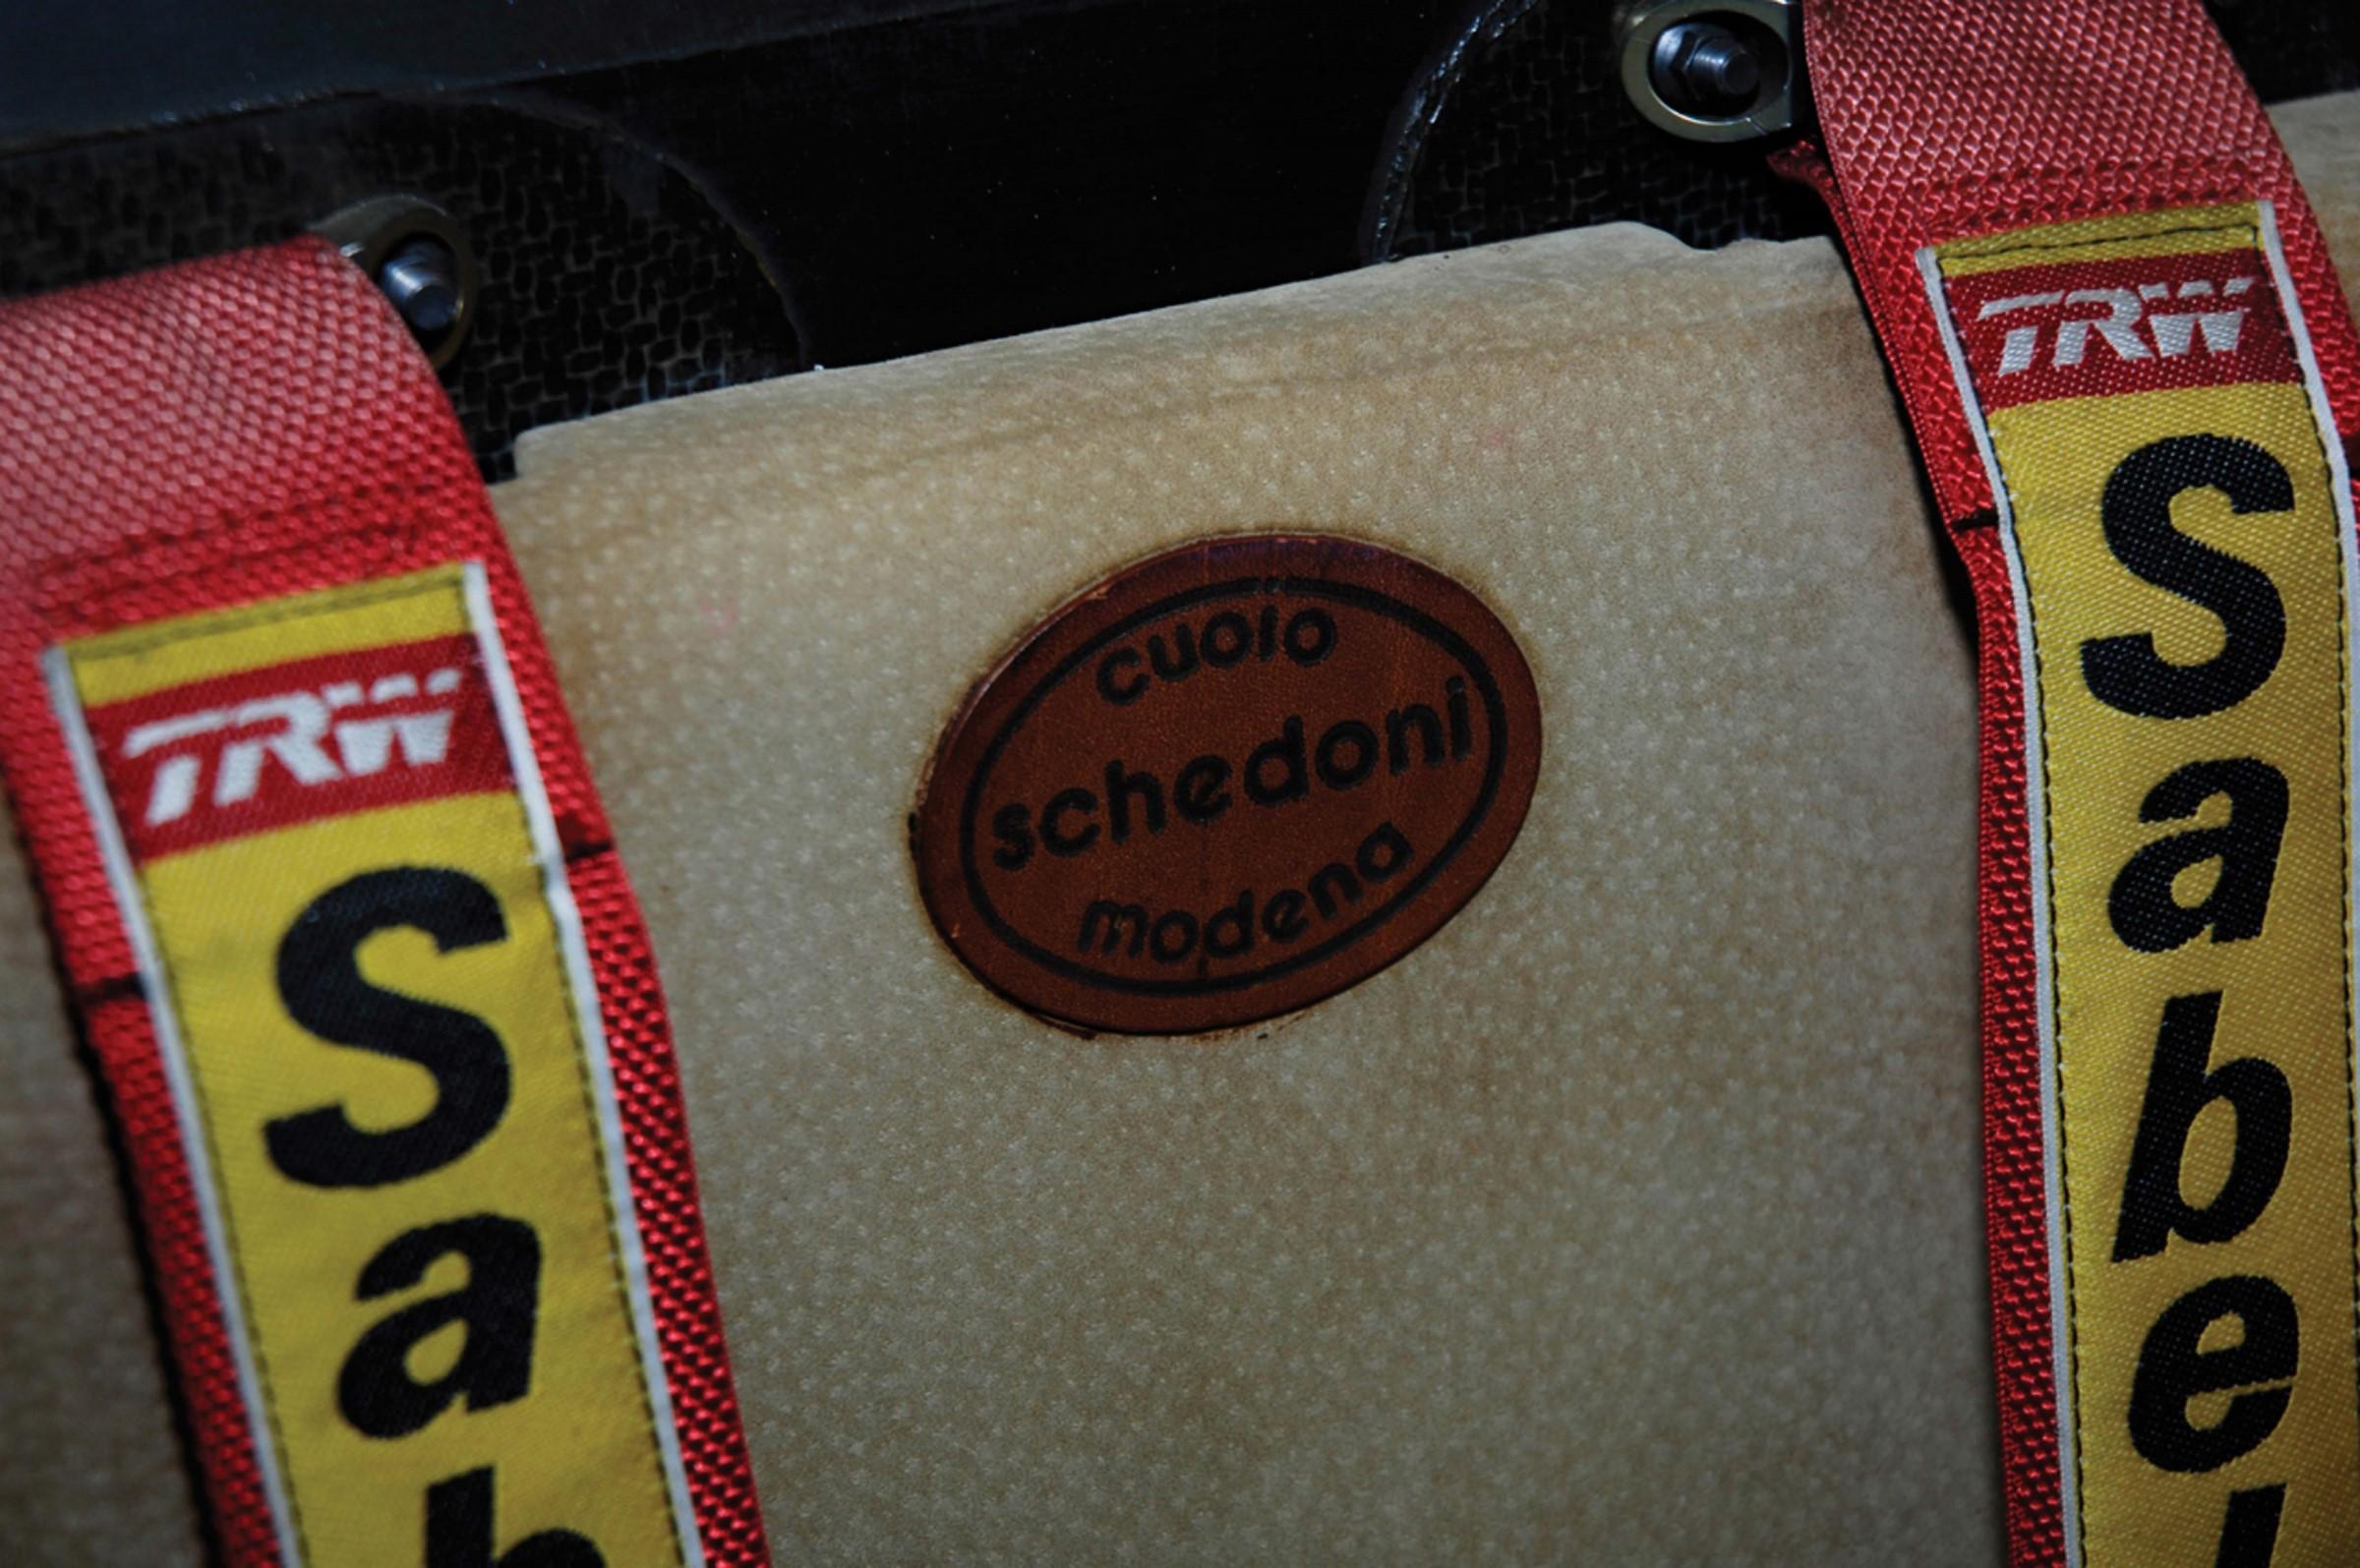 cuoio-schedoni-soymotor.jpg